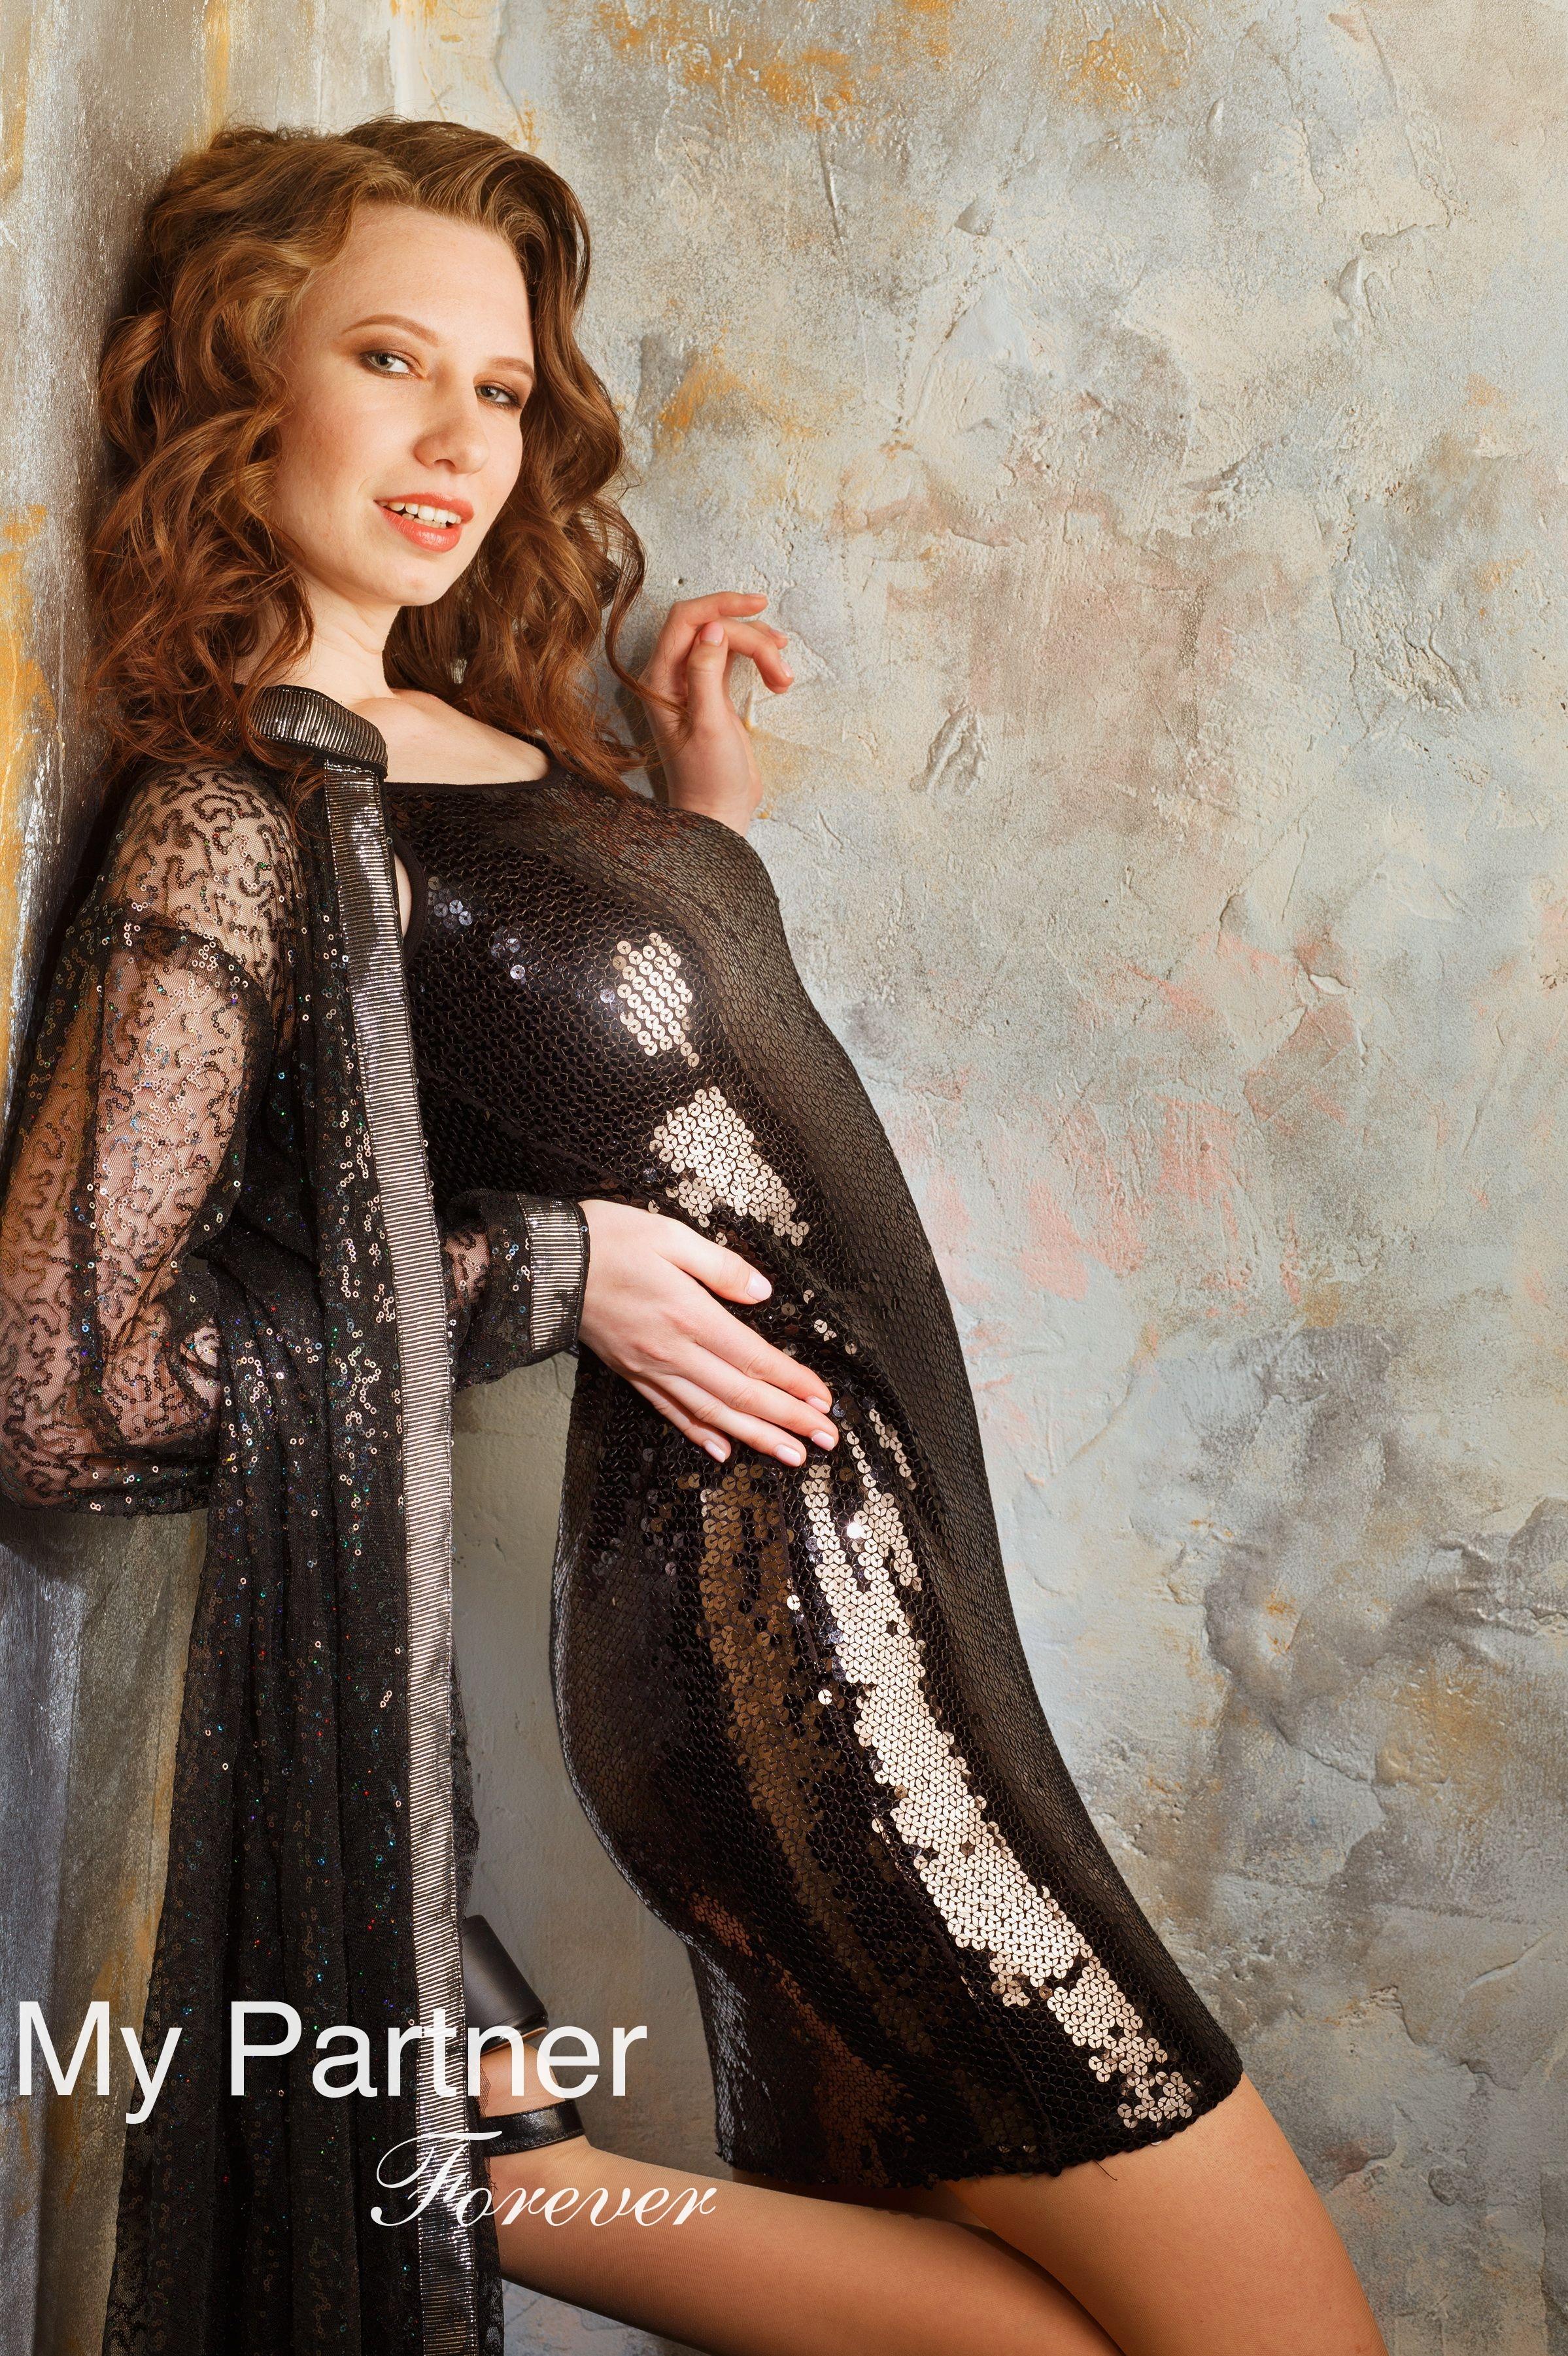 Pretty Lady from Belarus - Karina from Grodno, Belarus